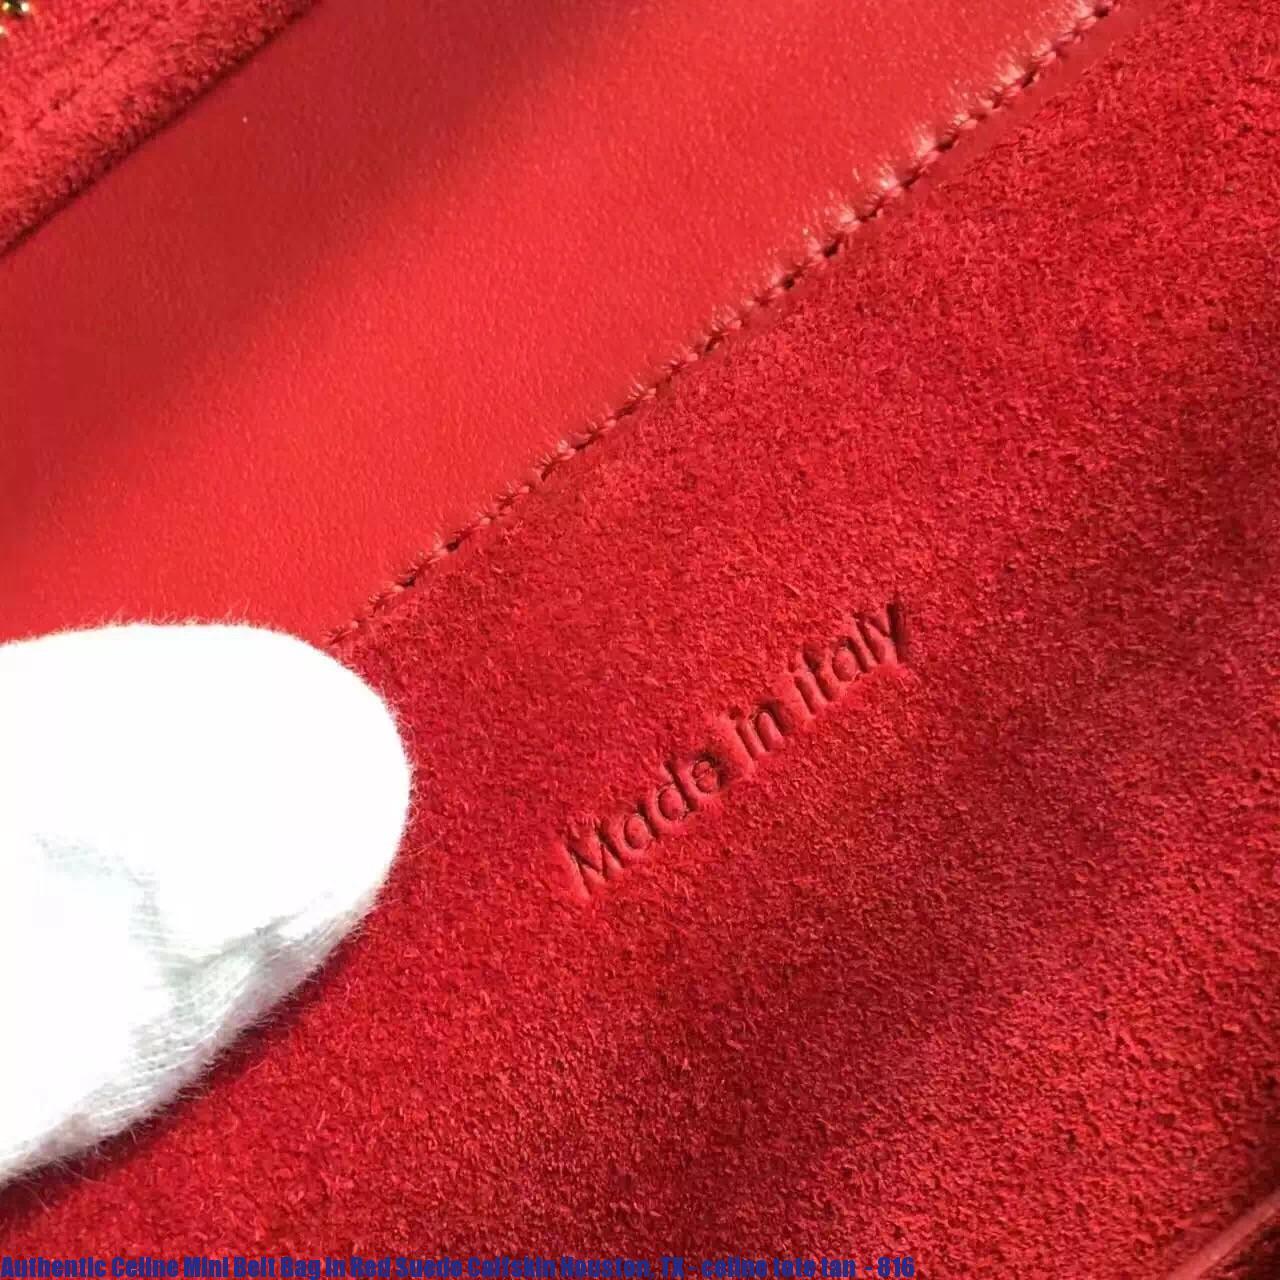 3b9b8ea580 Authentic Celine Mini Belt Bag In Red Suede Calfskin Houston